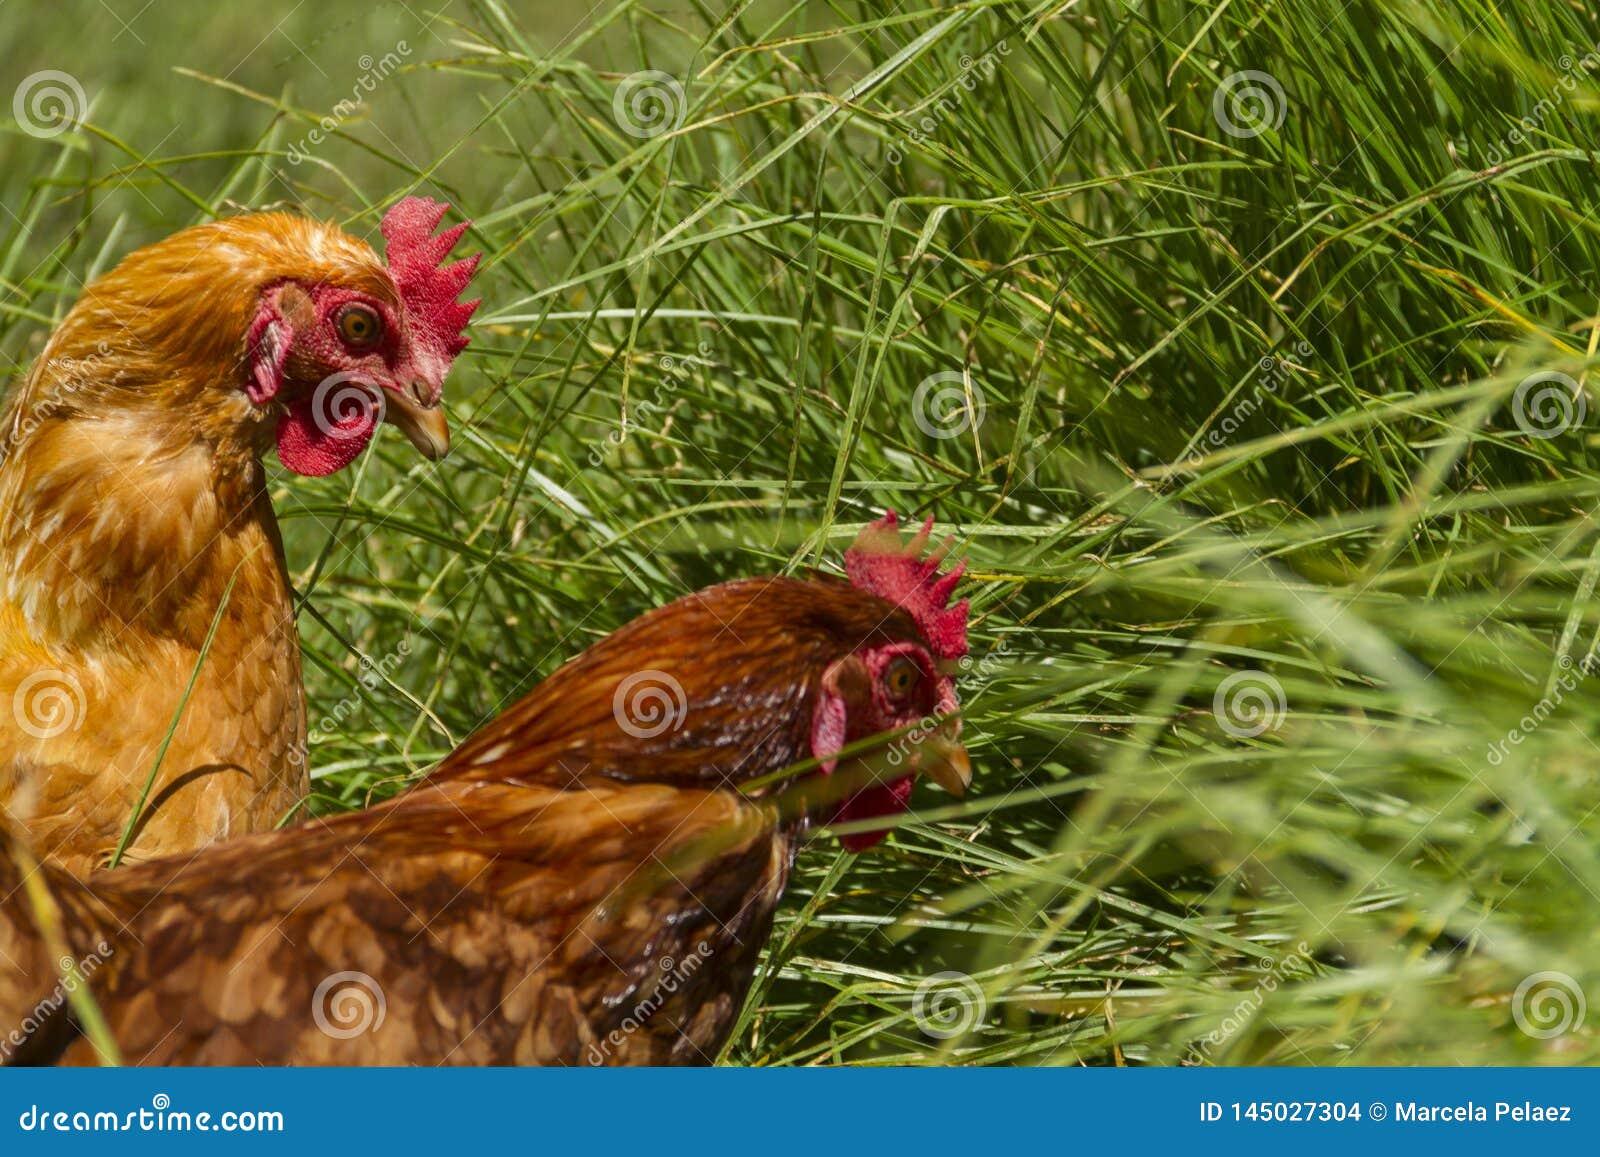 Free chickens in organic egg farm walking on green grass